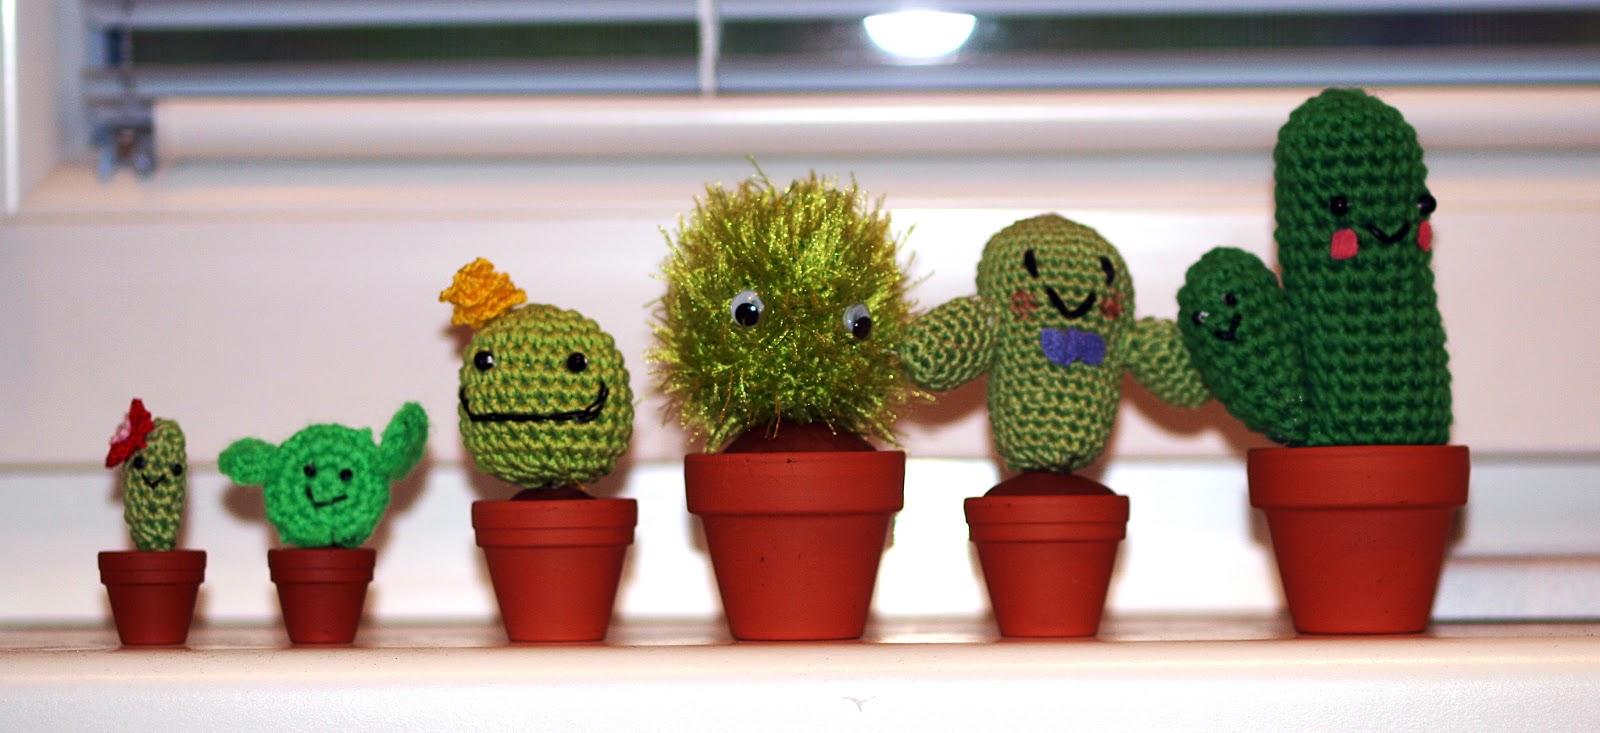 lizart amigurumi mein kleiener gr ner kaktus anleitung. Black Bedroom Furniture Sets. Home Design Ideas